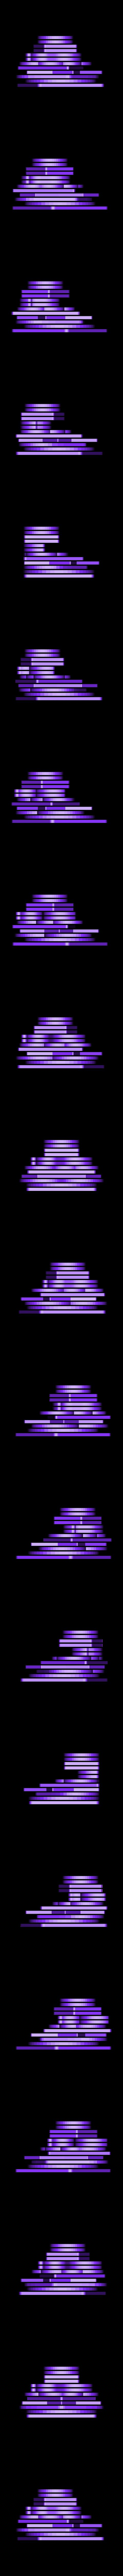 Pack02.stl Download free STL file Shapers • 3D printer design, 3deran